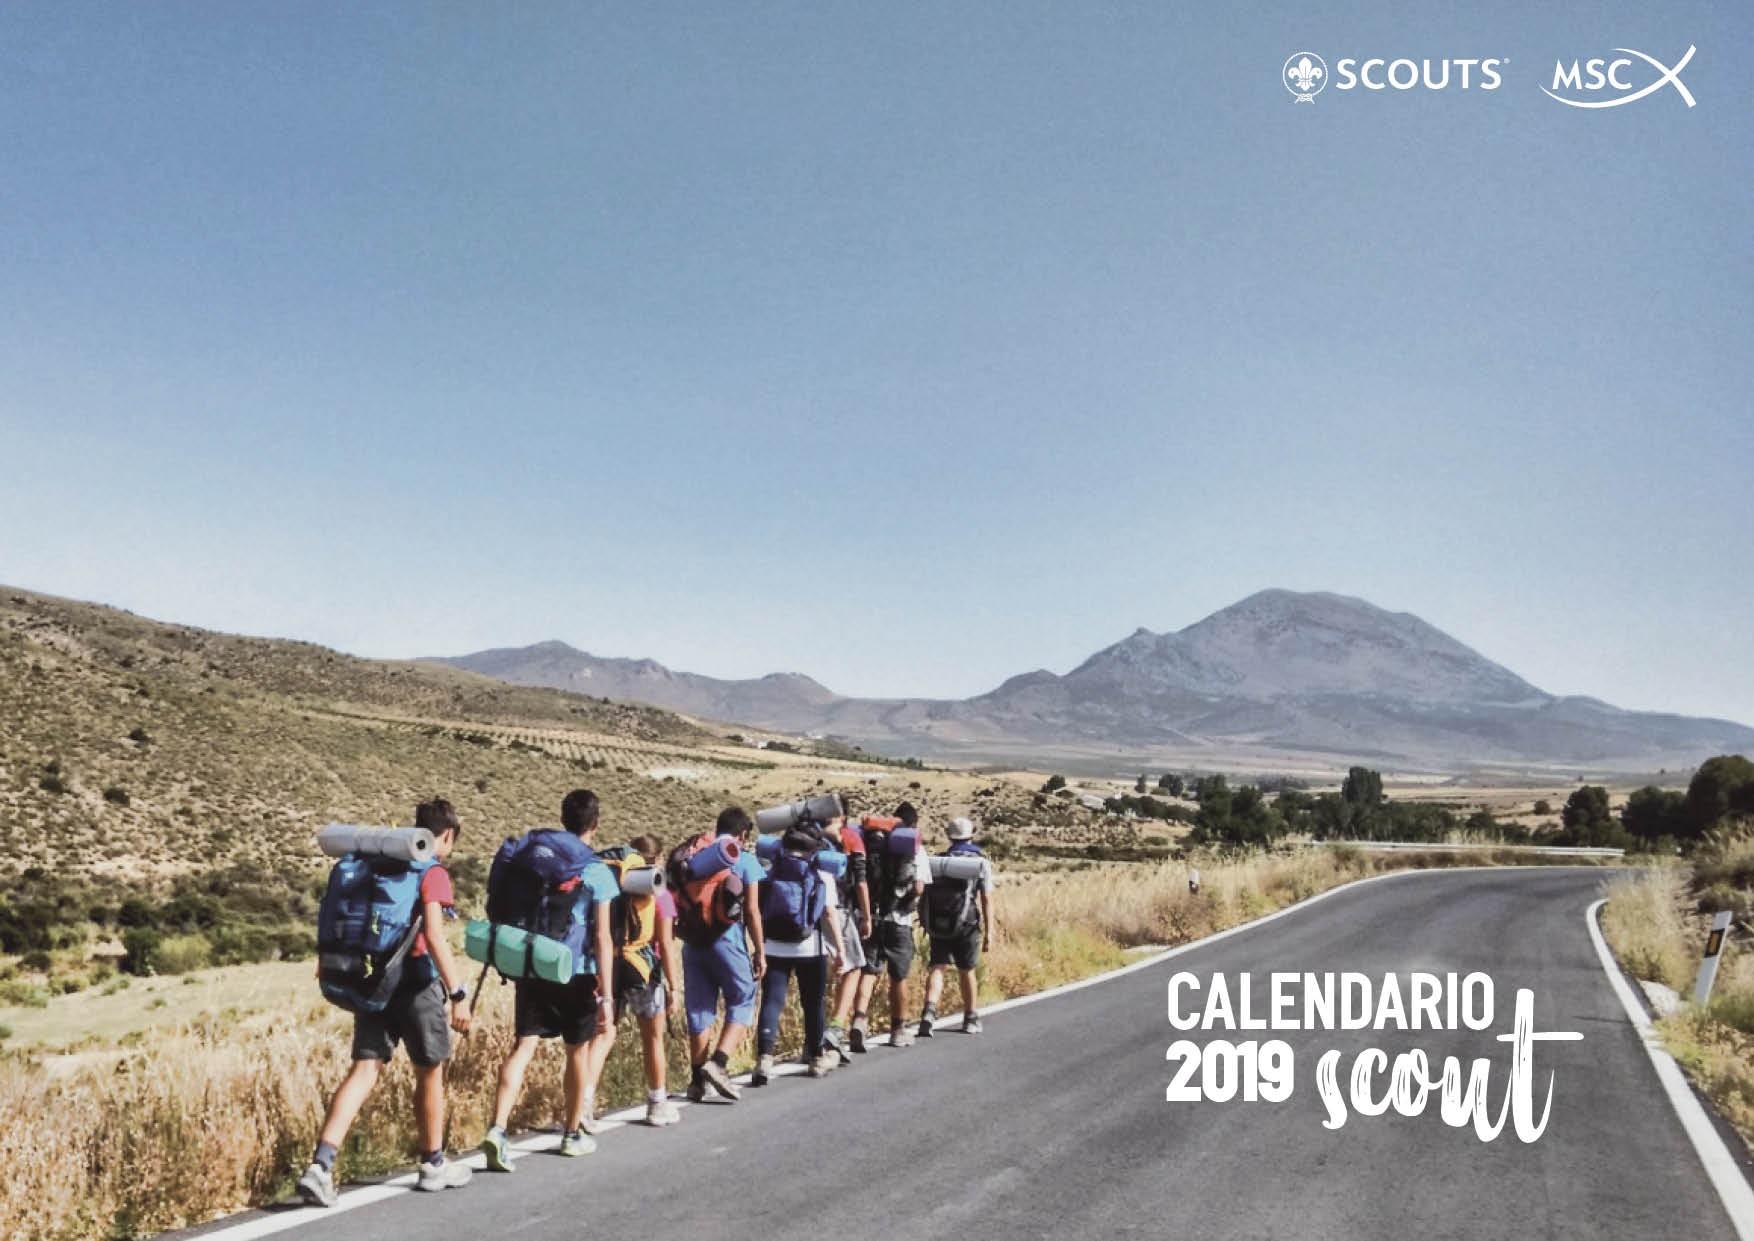 Calendario Scouts MSC 2019